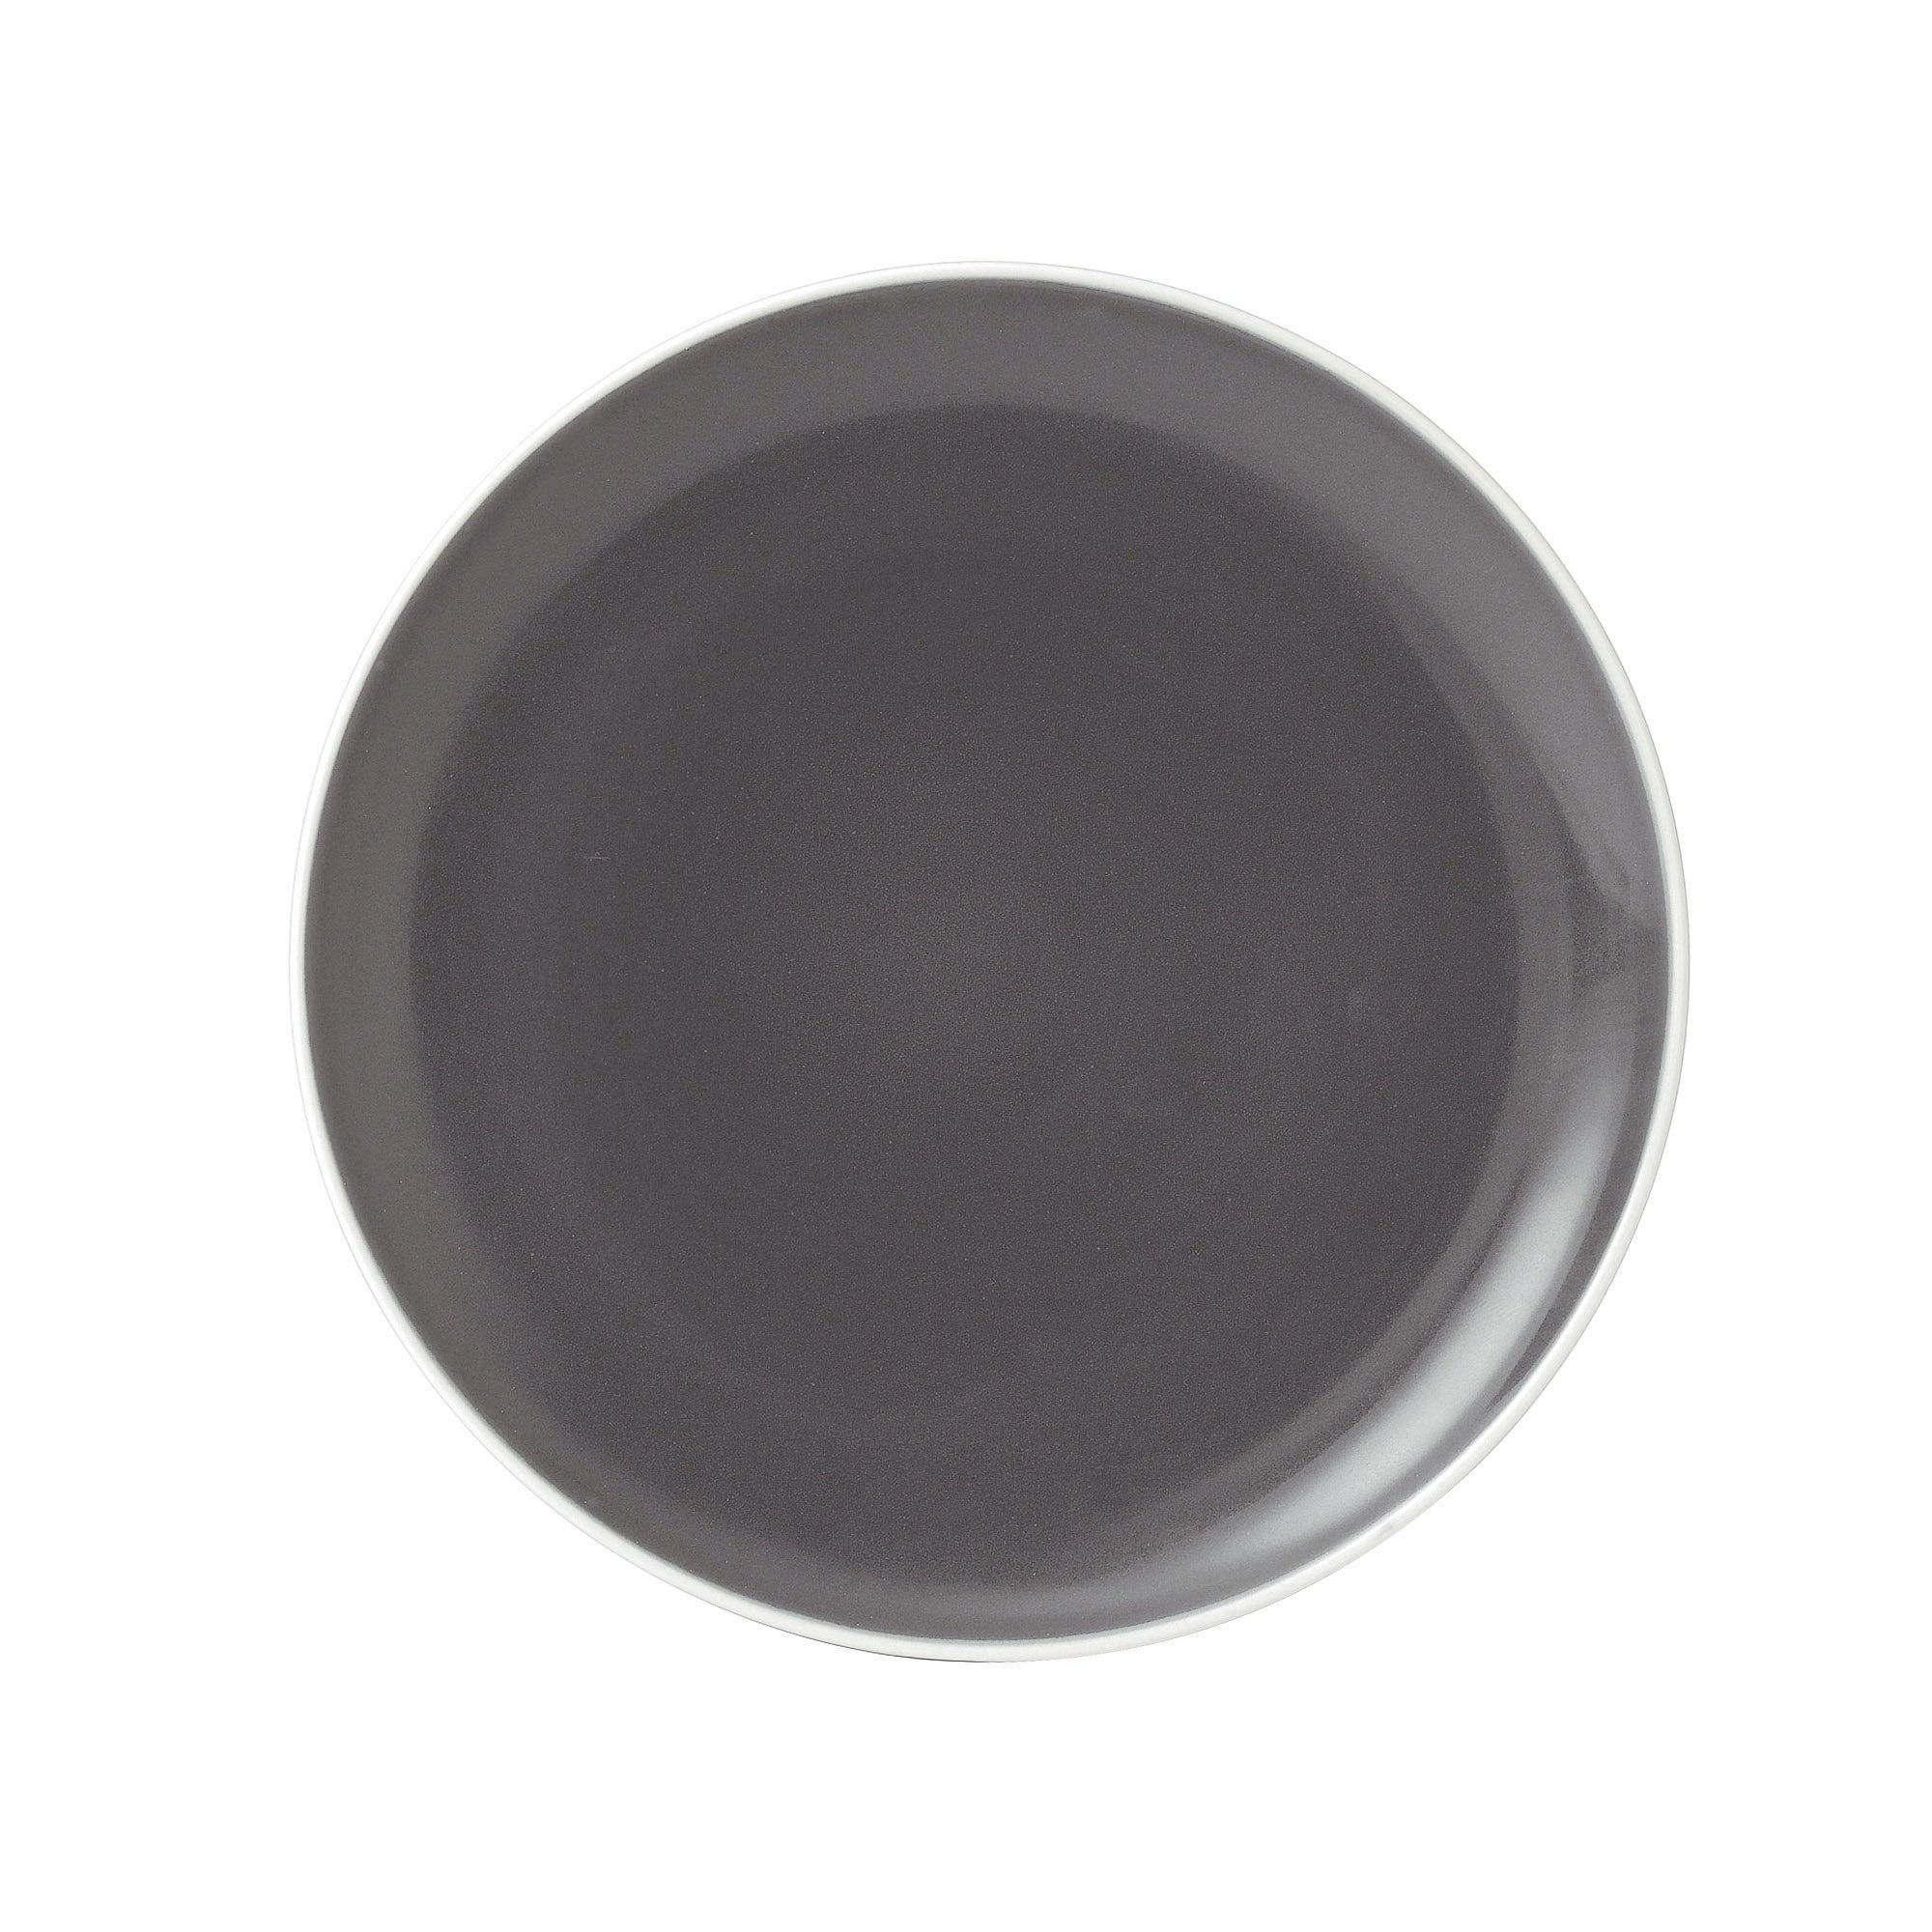 Gordon Ramsay Slate Bread Street Collection Side Plate